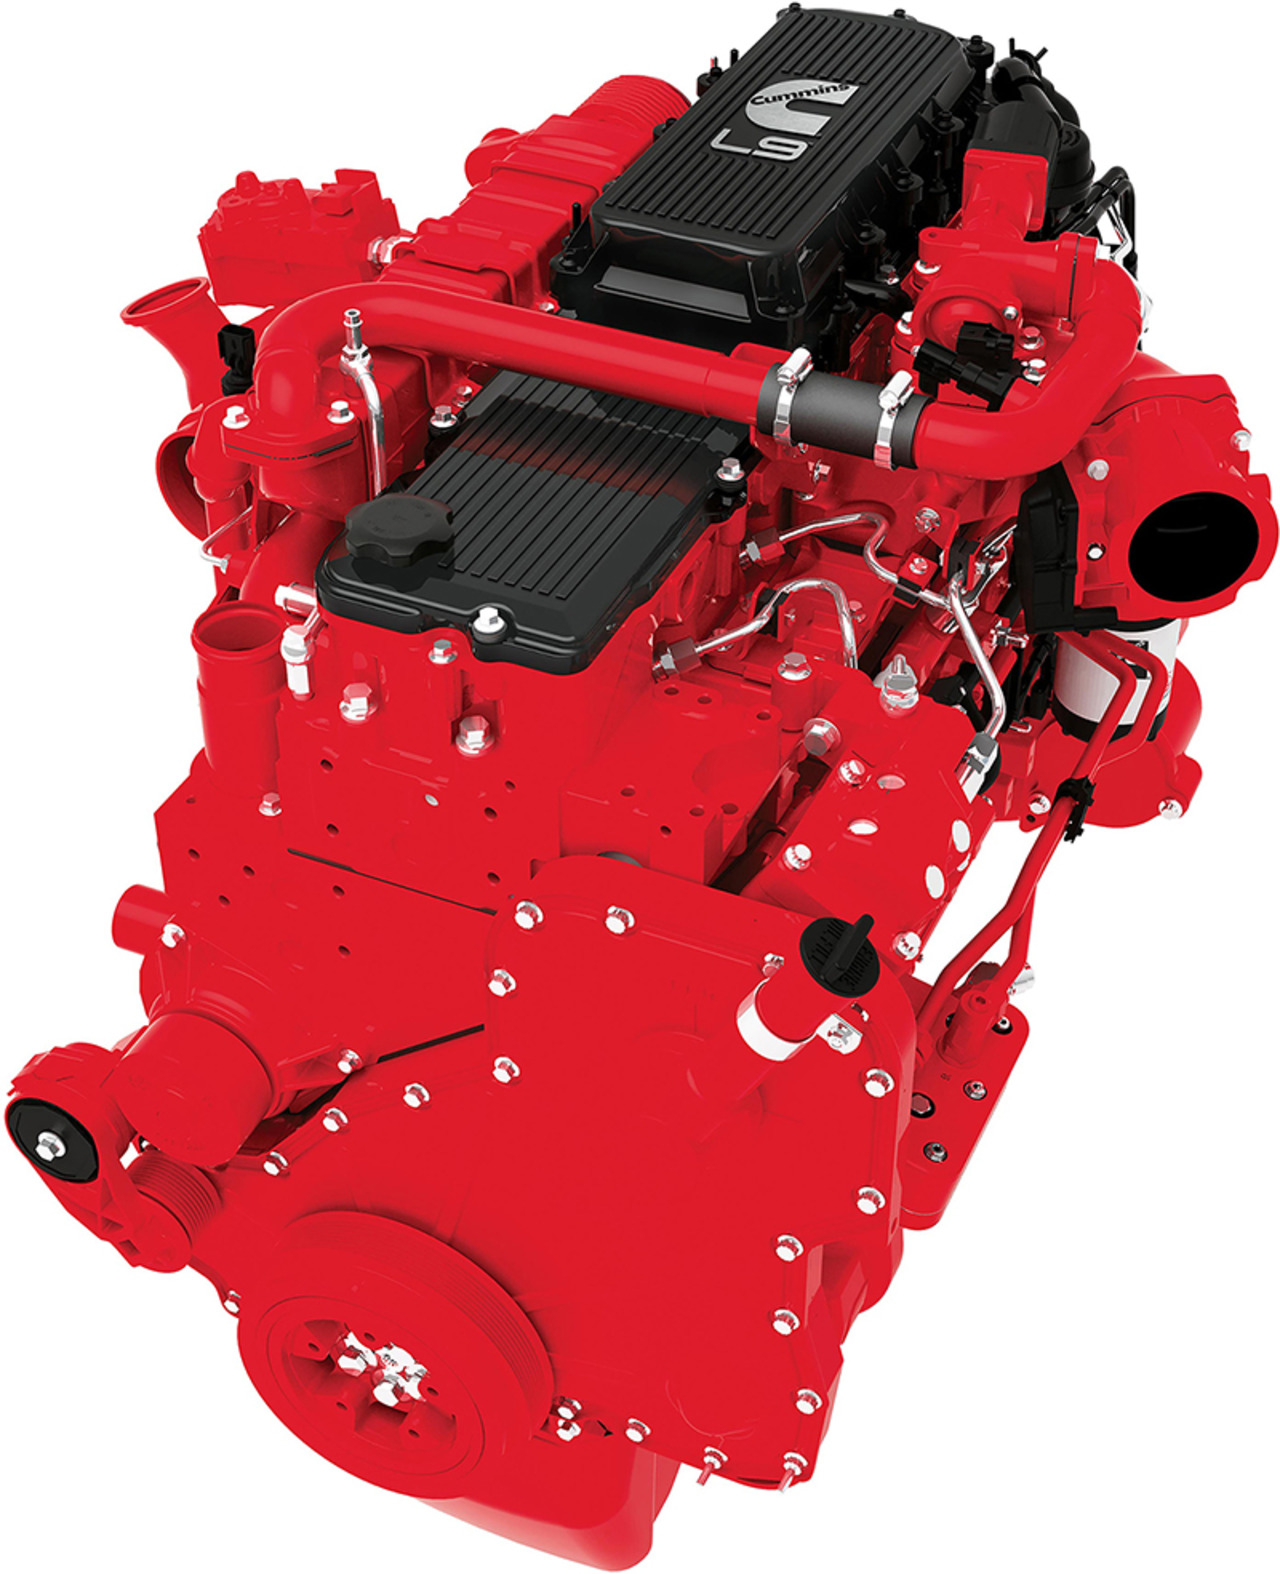 Firefighter Product News - Cummins L9 Engine, 10KW Onan Generator